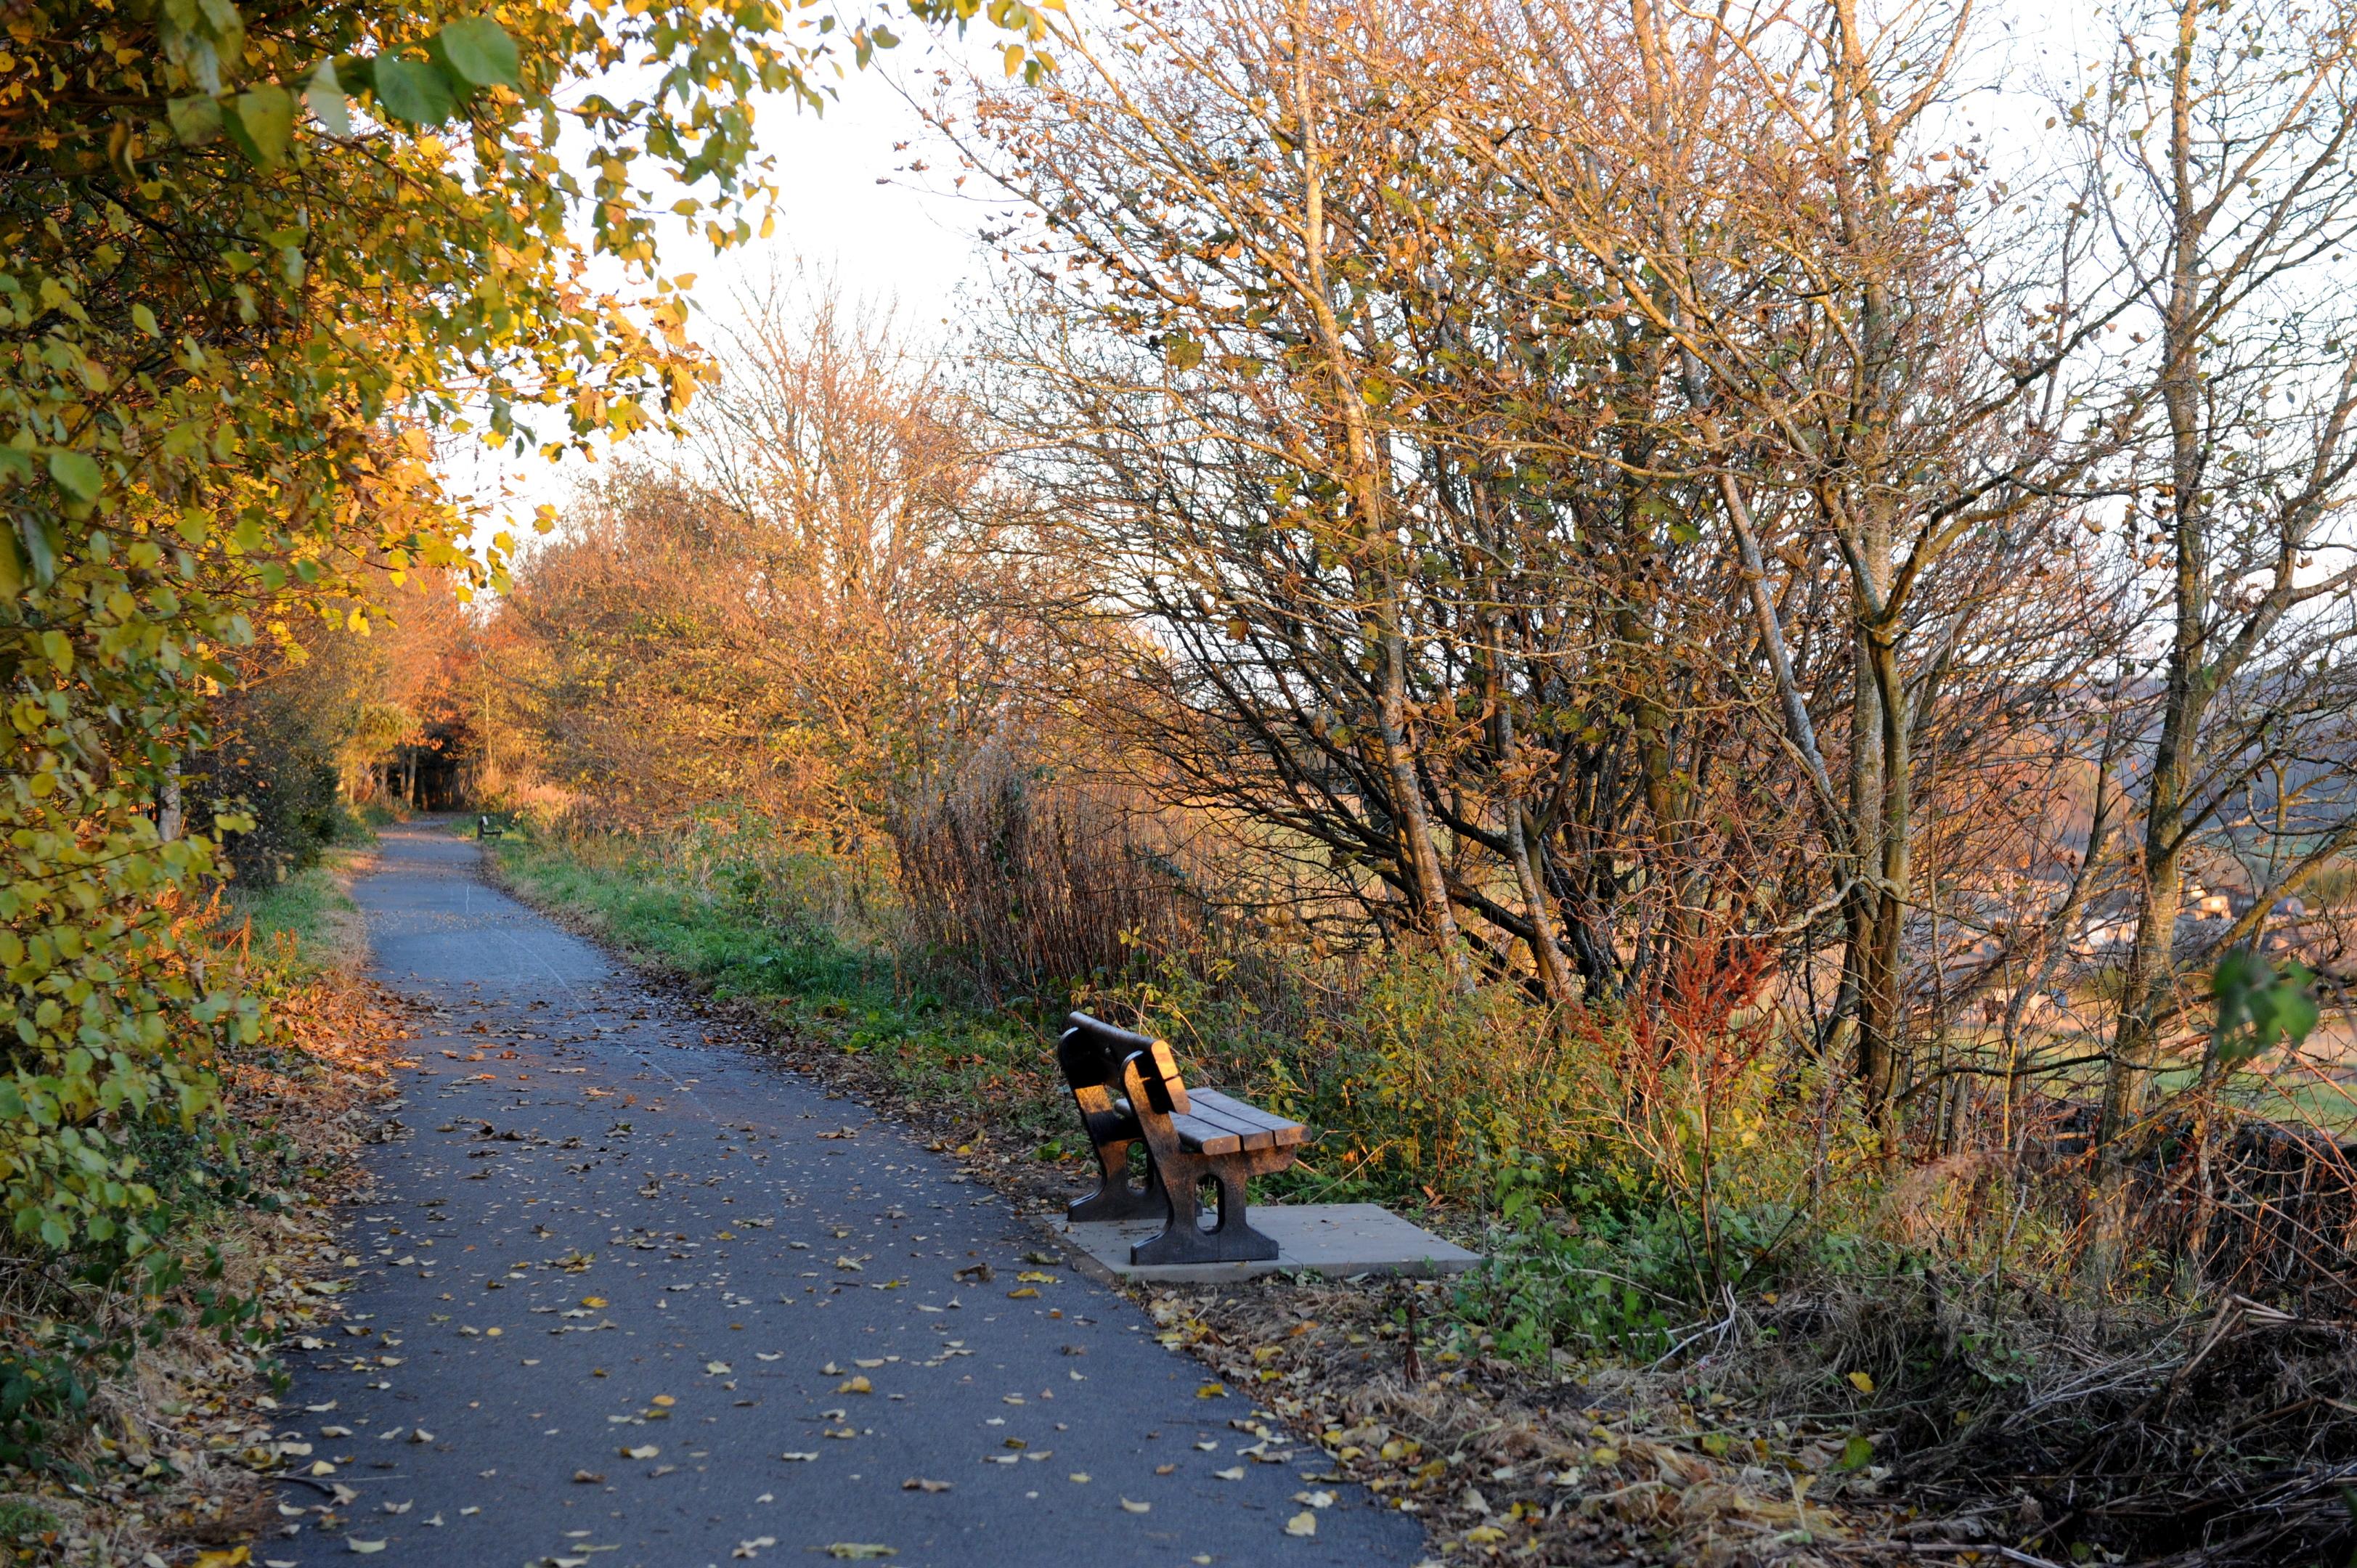 The former Deeside Line is a popular walking route